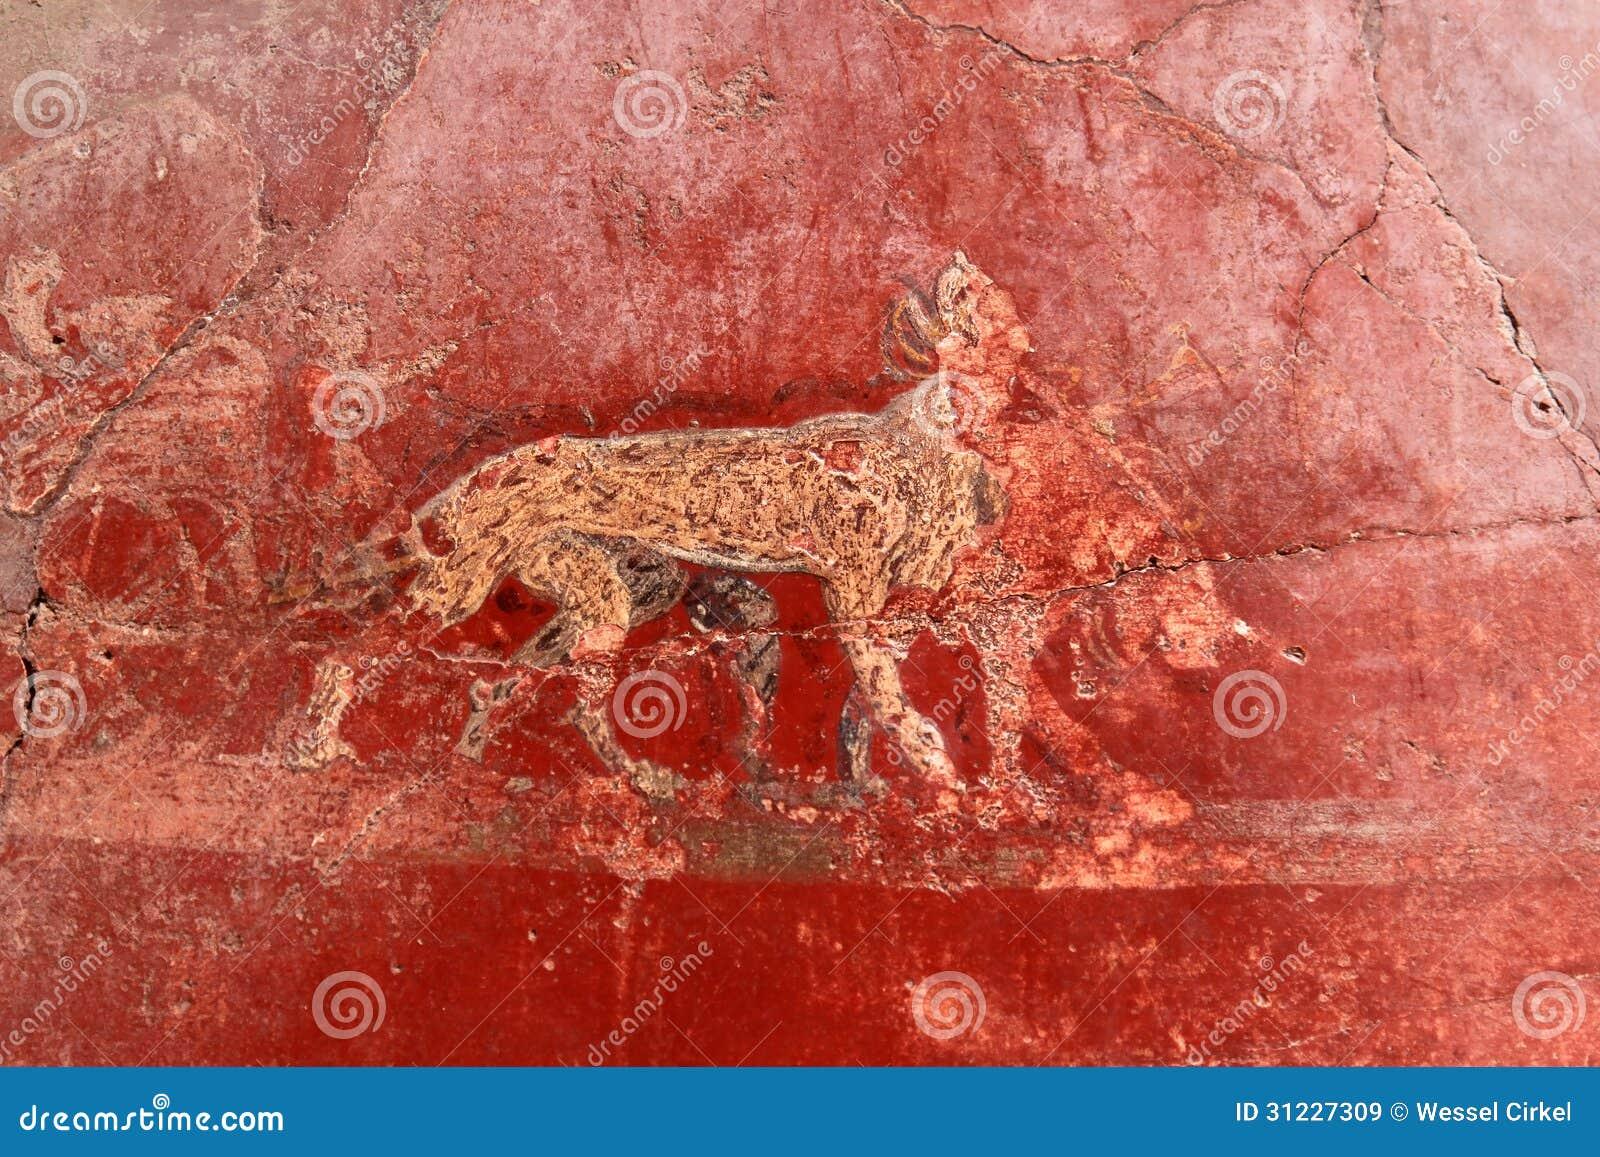 mural of animals in roman pompeii italy royalty free stock images mural of animals in roman pompeii italy royalty free stock images